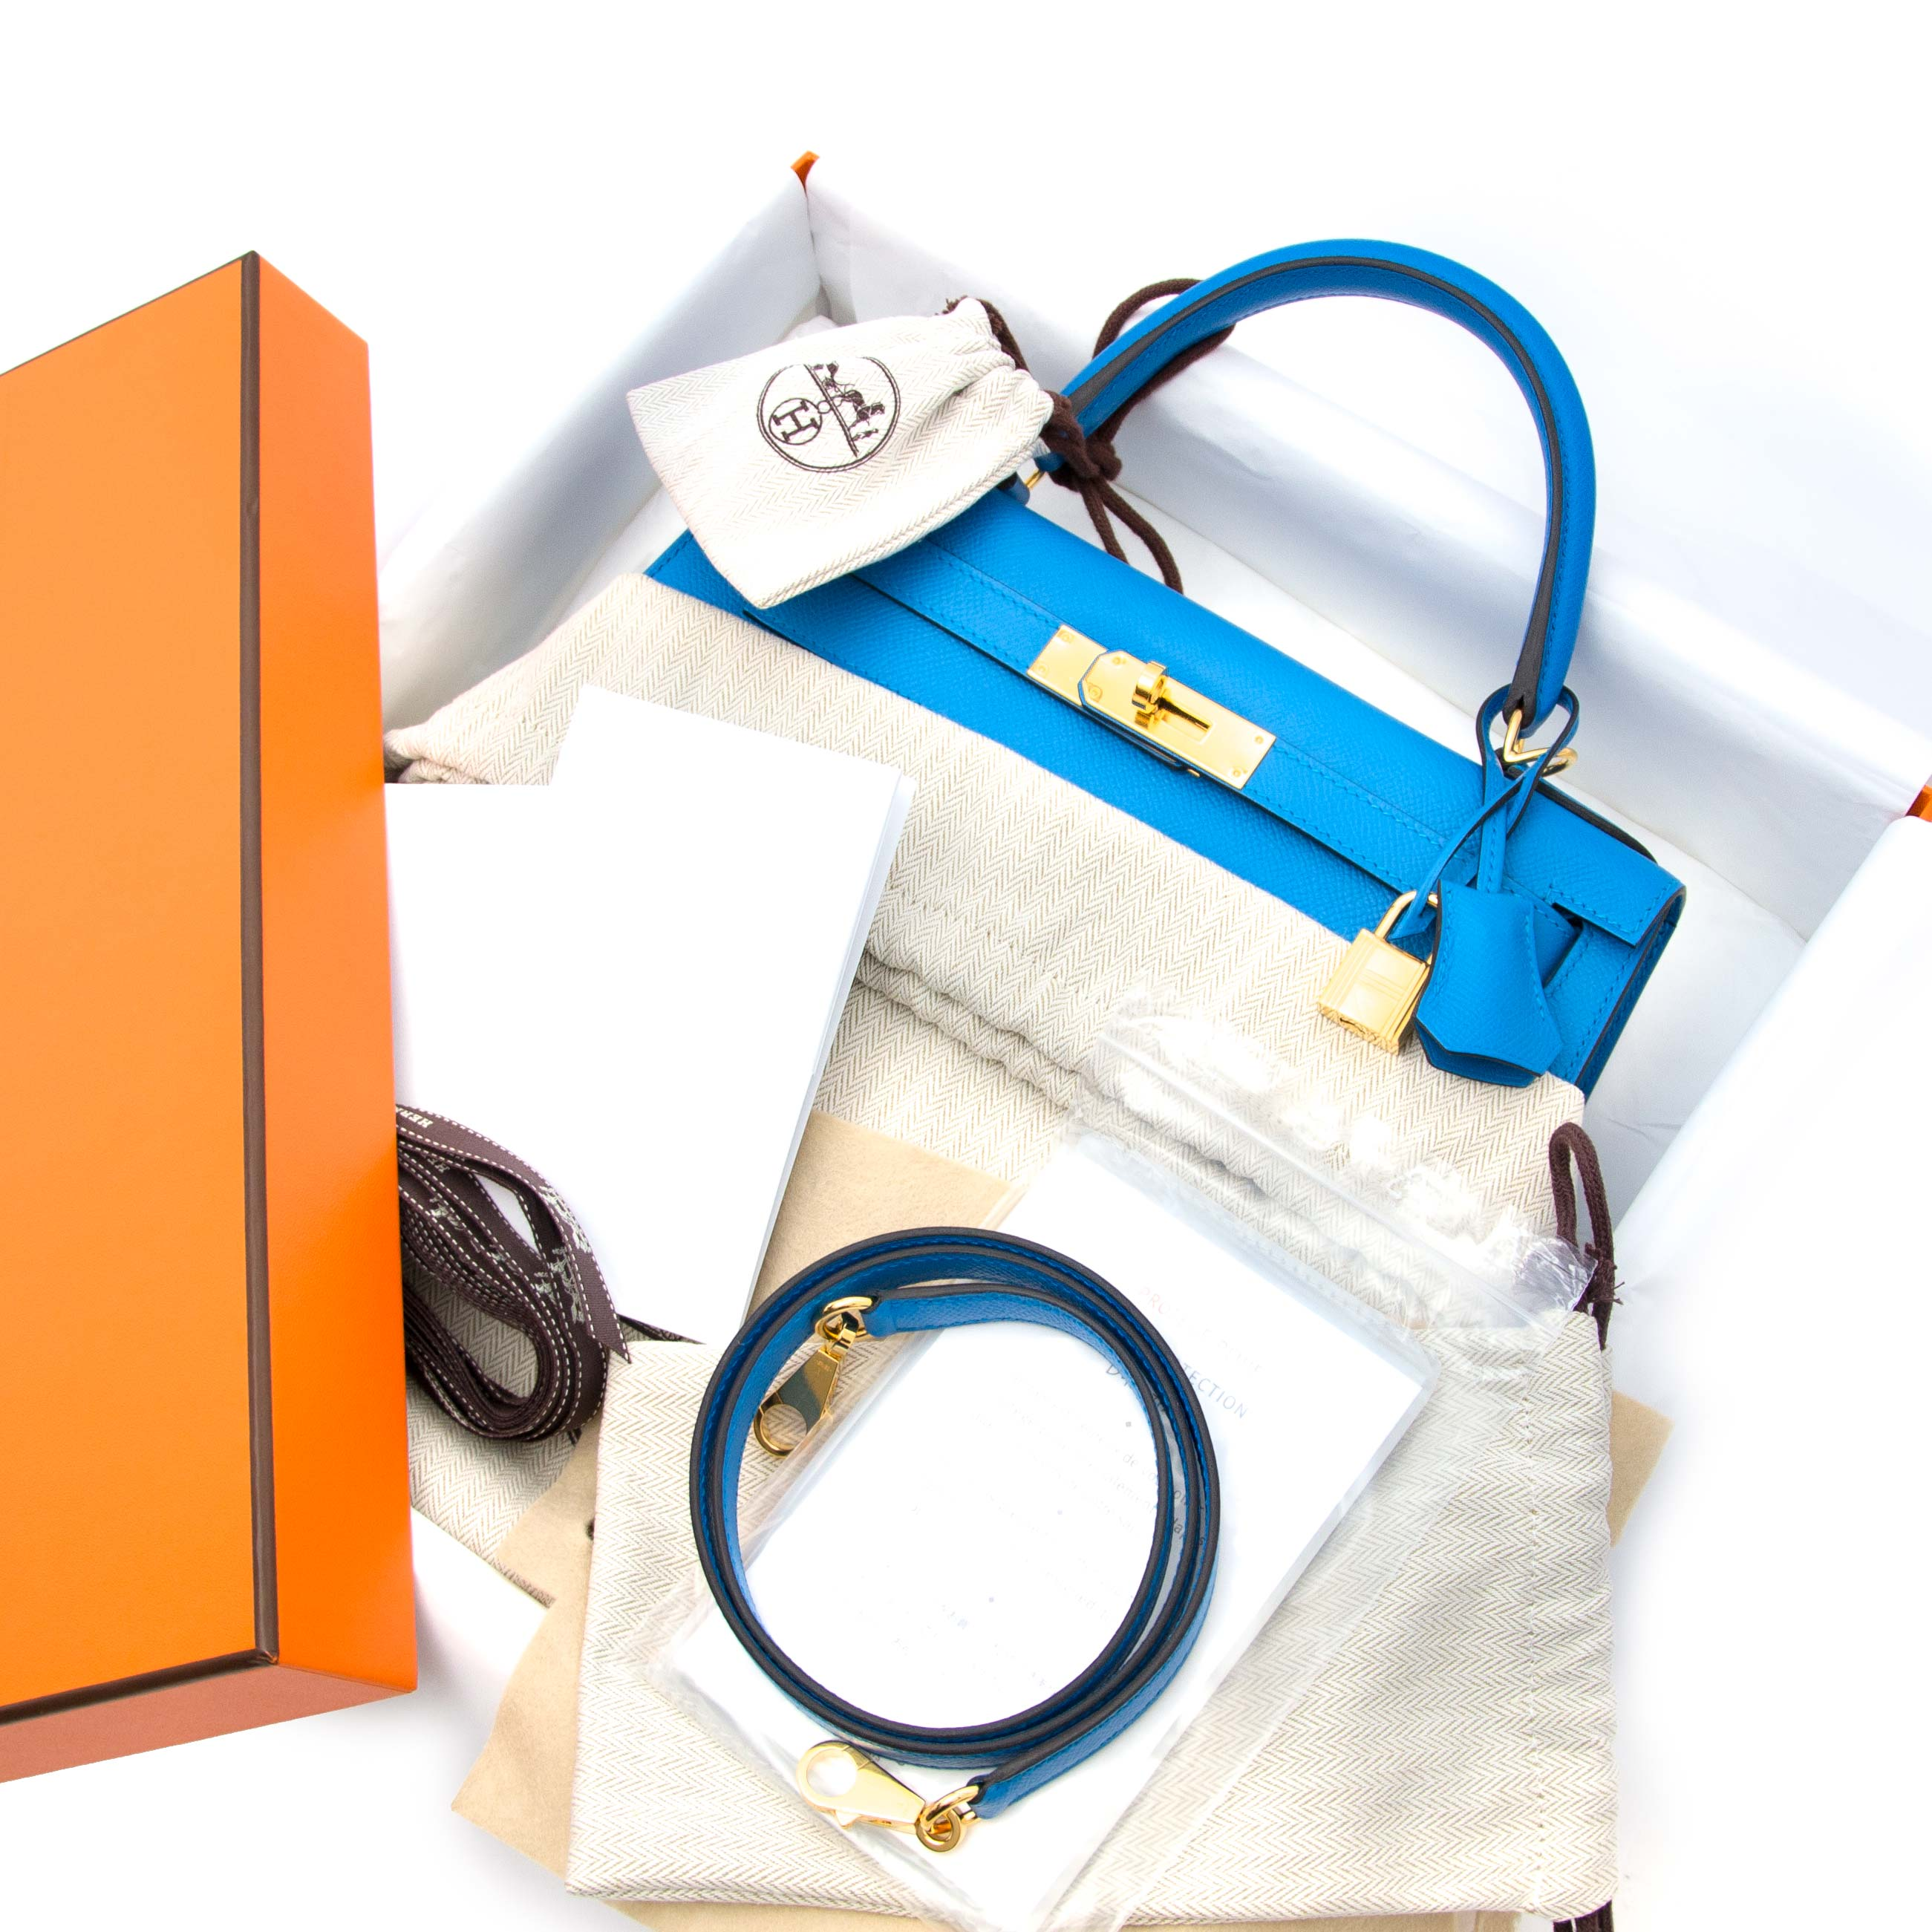 9f69d5c3a724 ... Zanzibar GHW shop your luxury acheter en ligne neuf sac a main Hermès  Kelly Sellier 28 Epsom Bleu